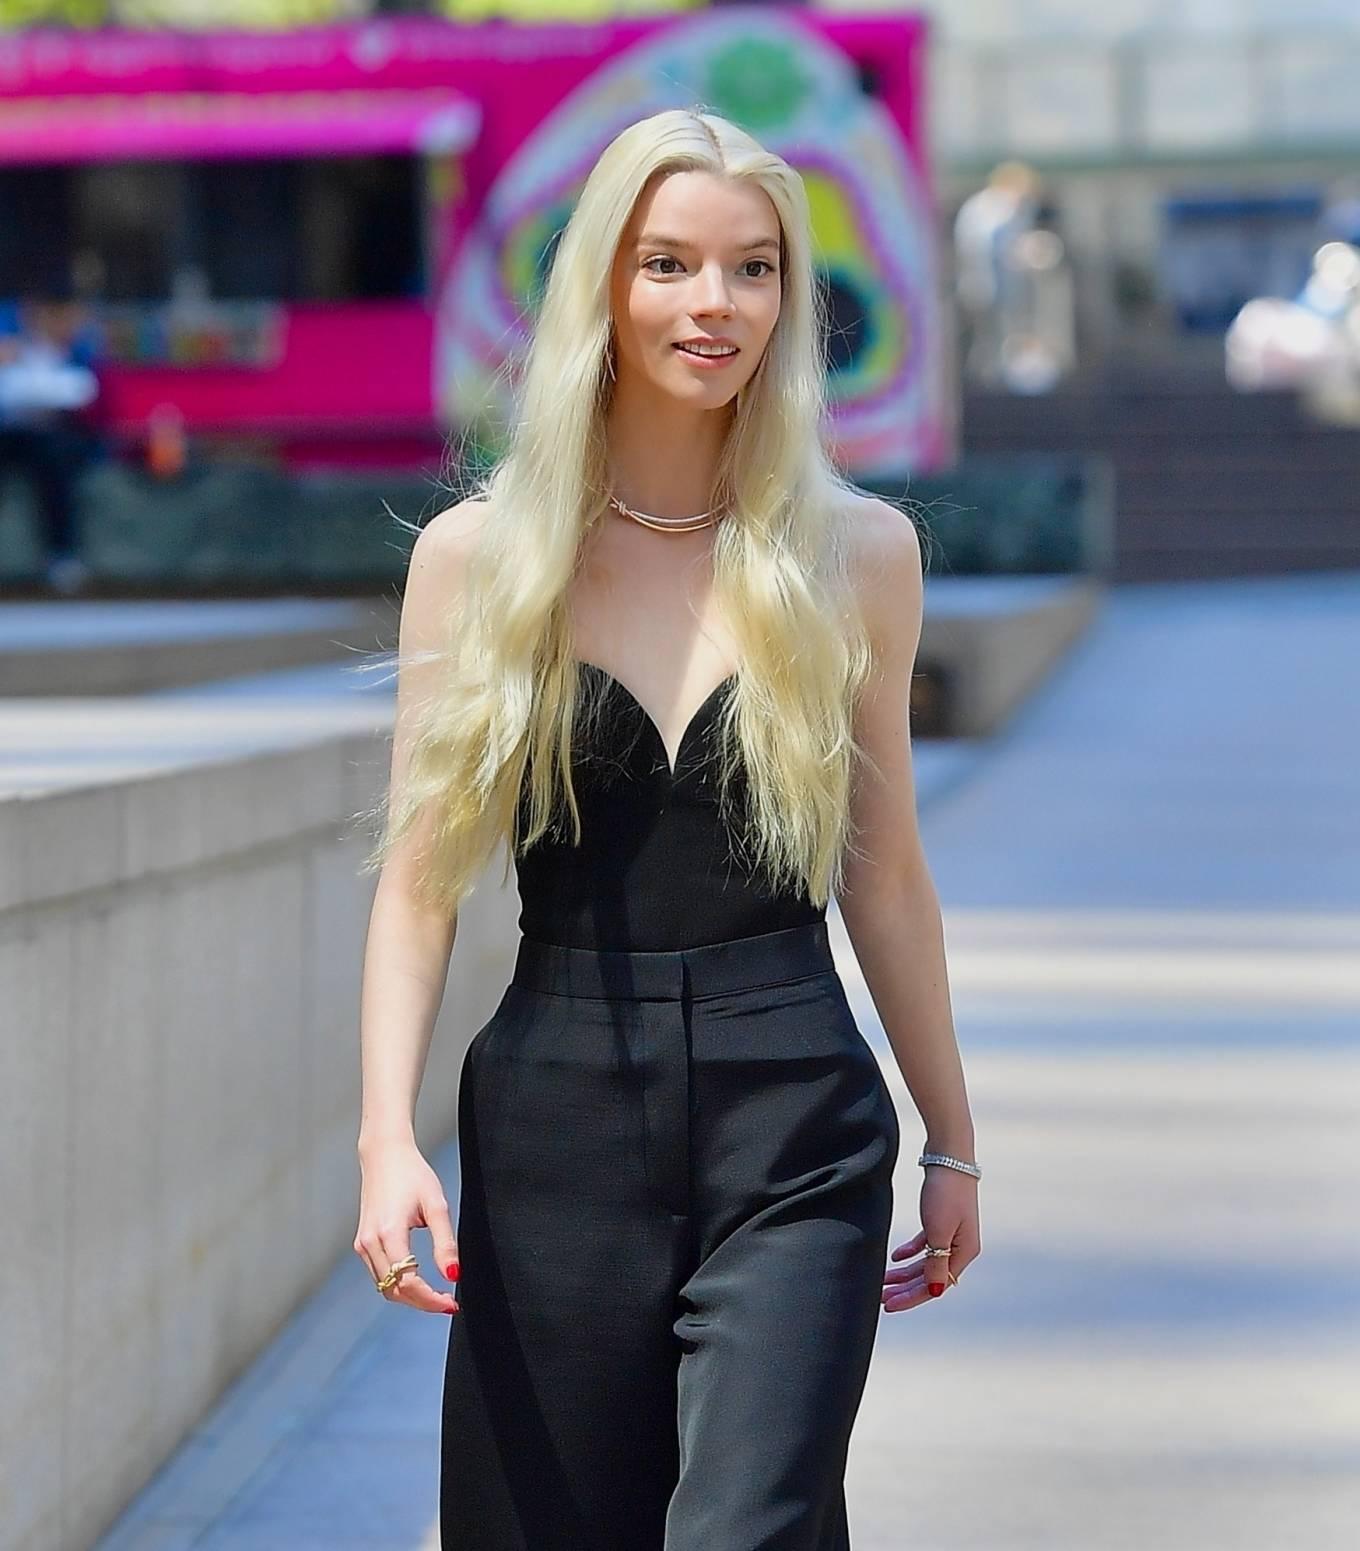 Anya Taylor-Joy 2021 : Anya Taylor-Joy – Shooting advert for Tiffany and Co in New York-02